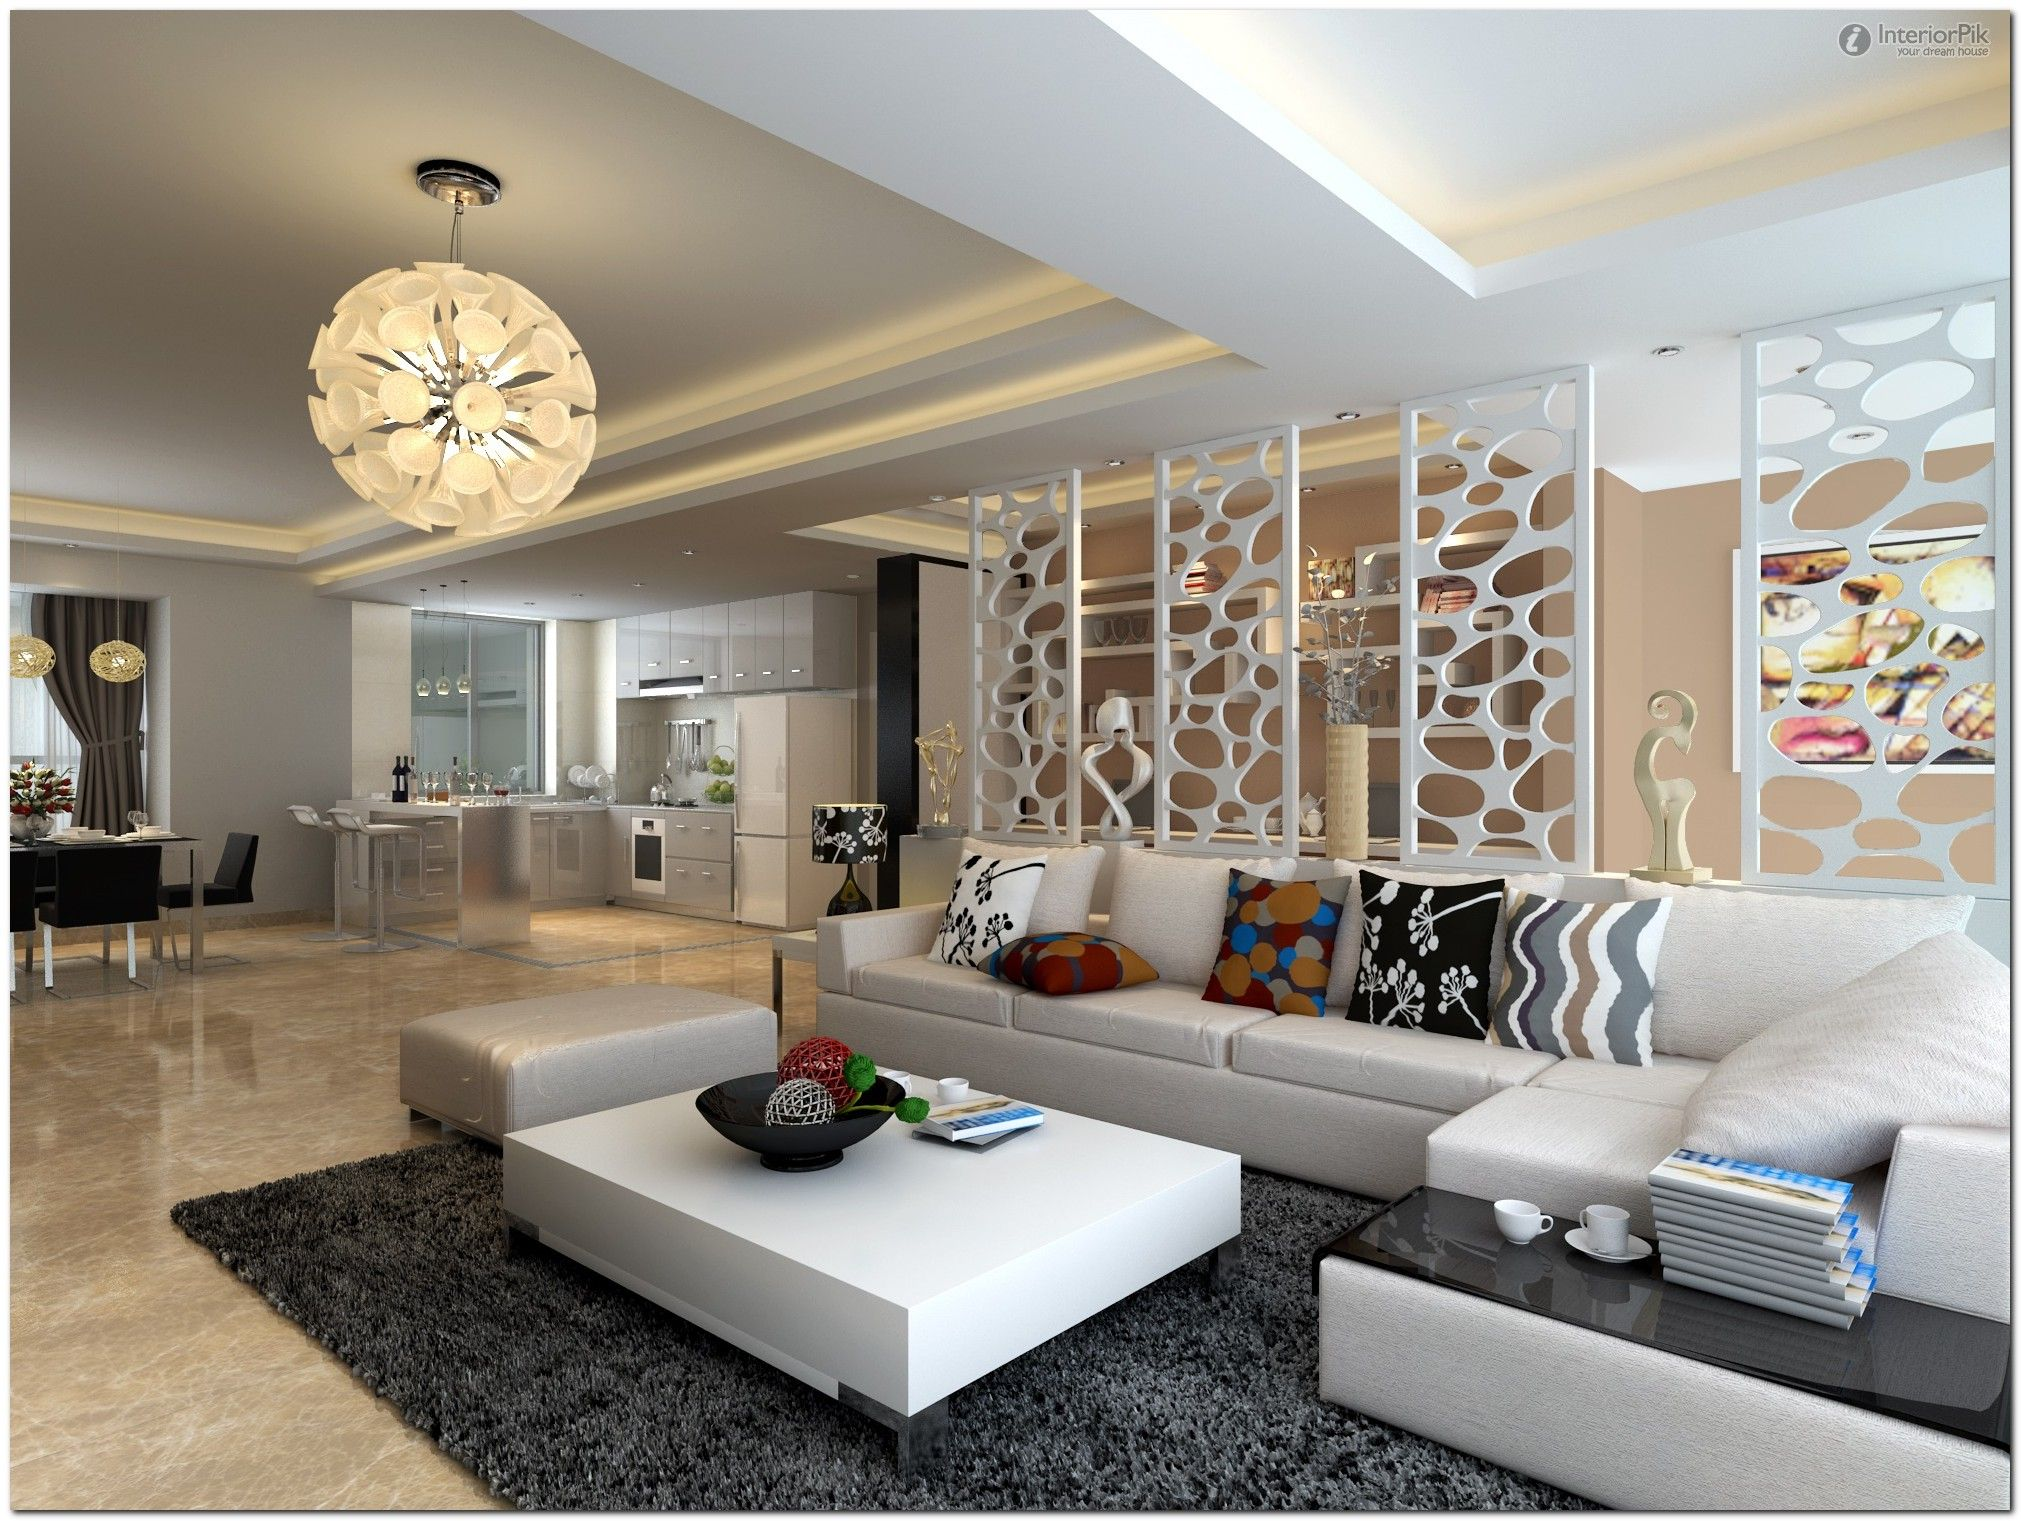 Contemporary Designs For Living Room Awesome 50 Best Contemporary Decor Inspirations  Contemporary Decorating Design